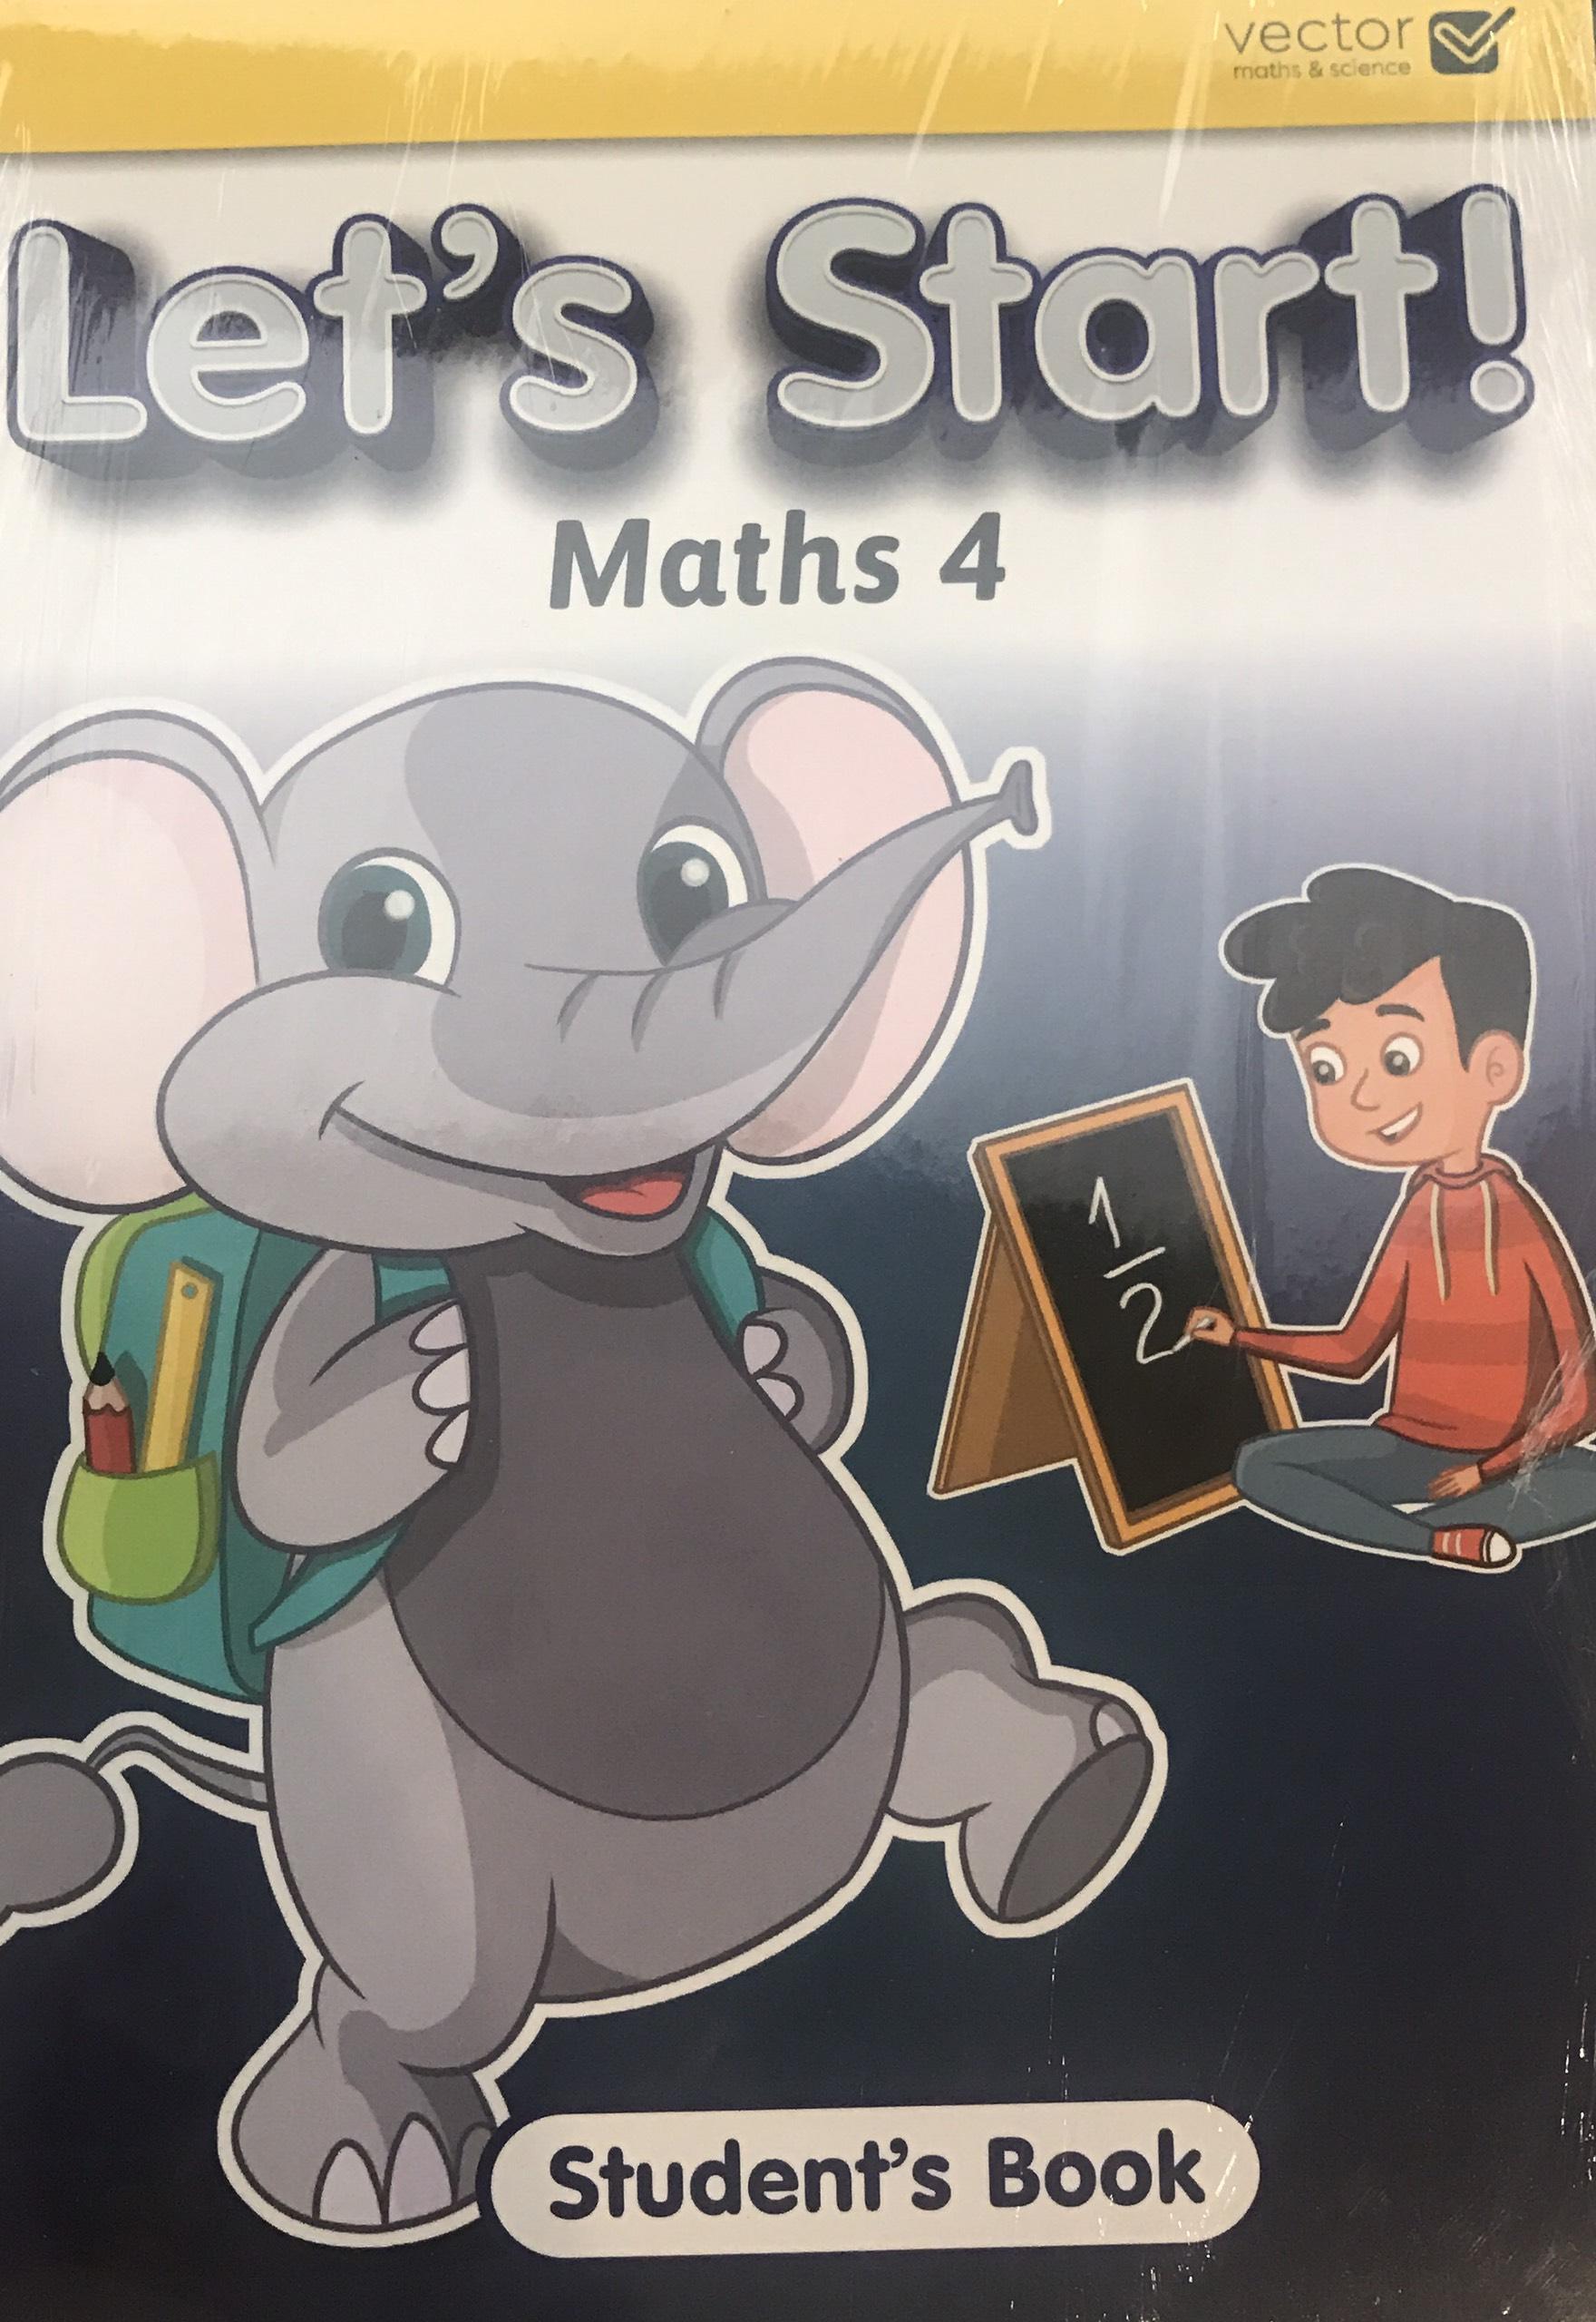 Vector: Sách hệ Singapore - Học toán bằng tiếng Anh - Let's Start! Maths 4 Student's Book